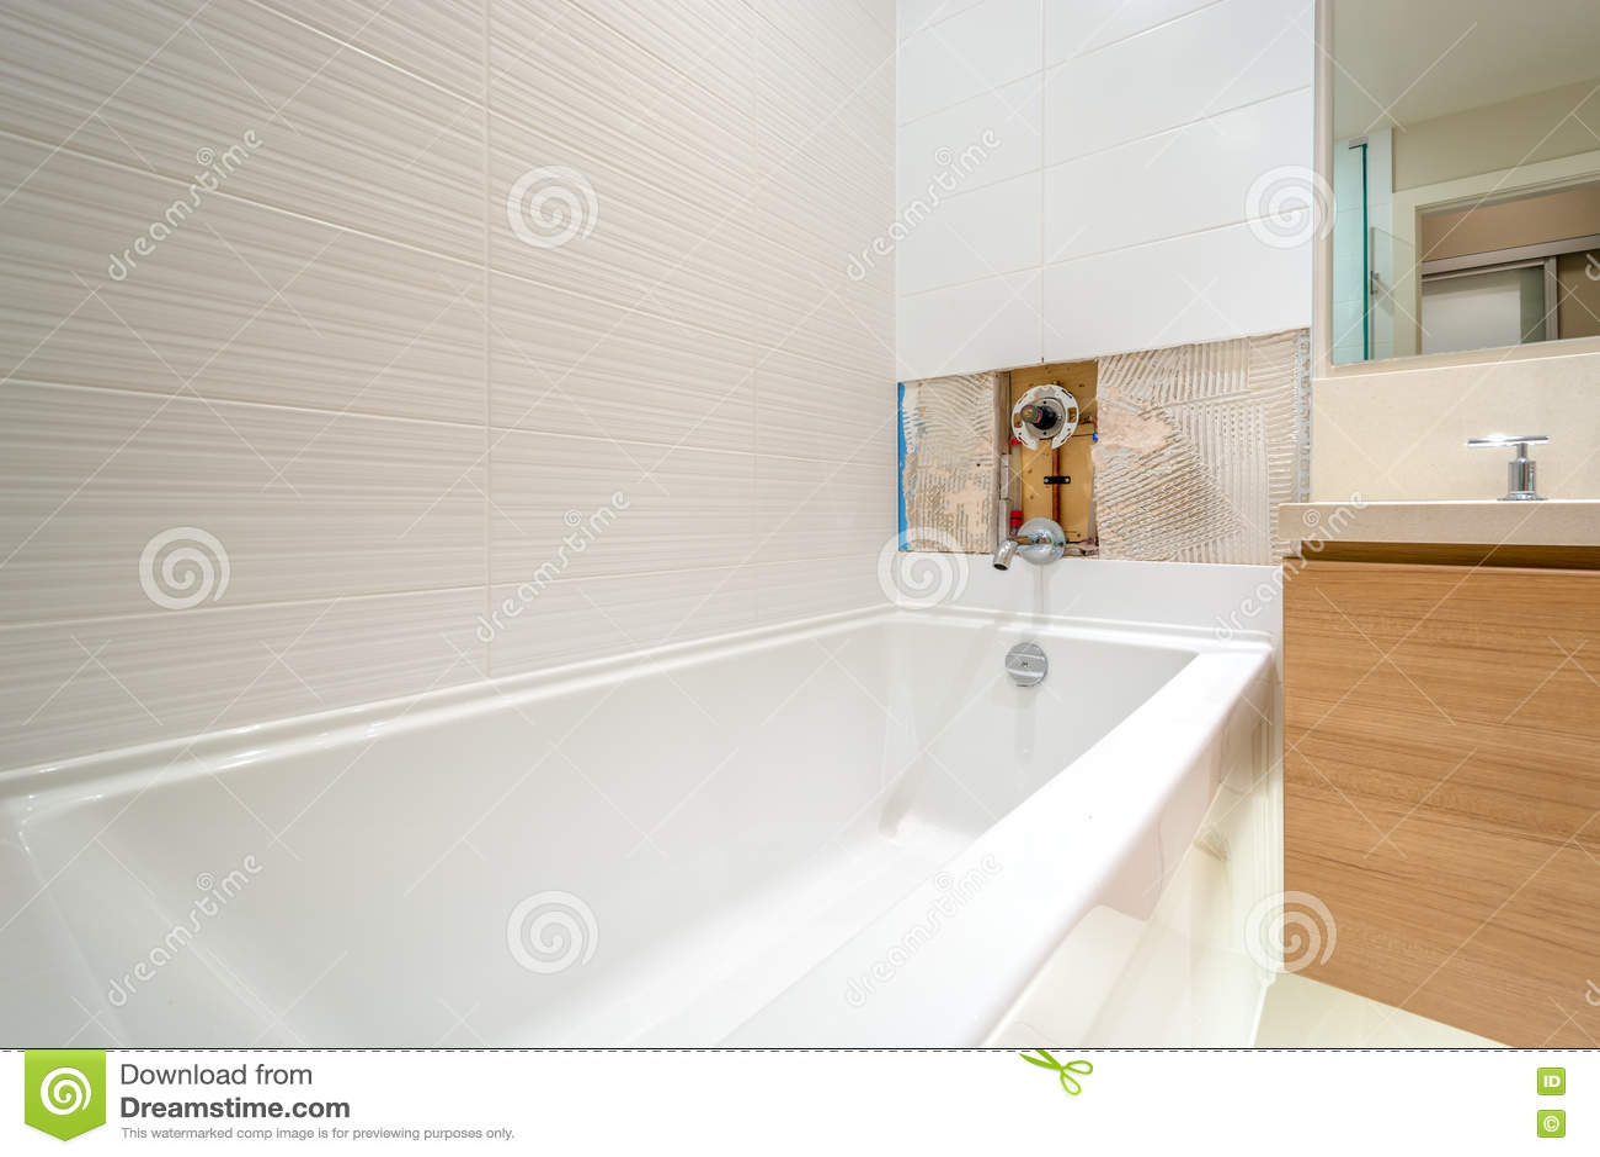 Faucet Repair In The Bathroom Stock Image - Image of home, equipment ...